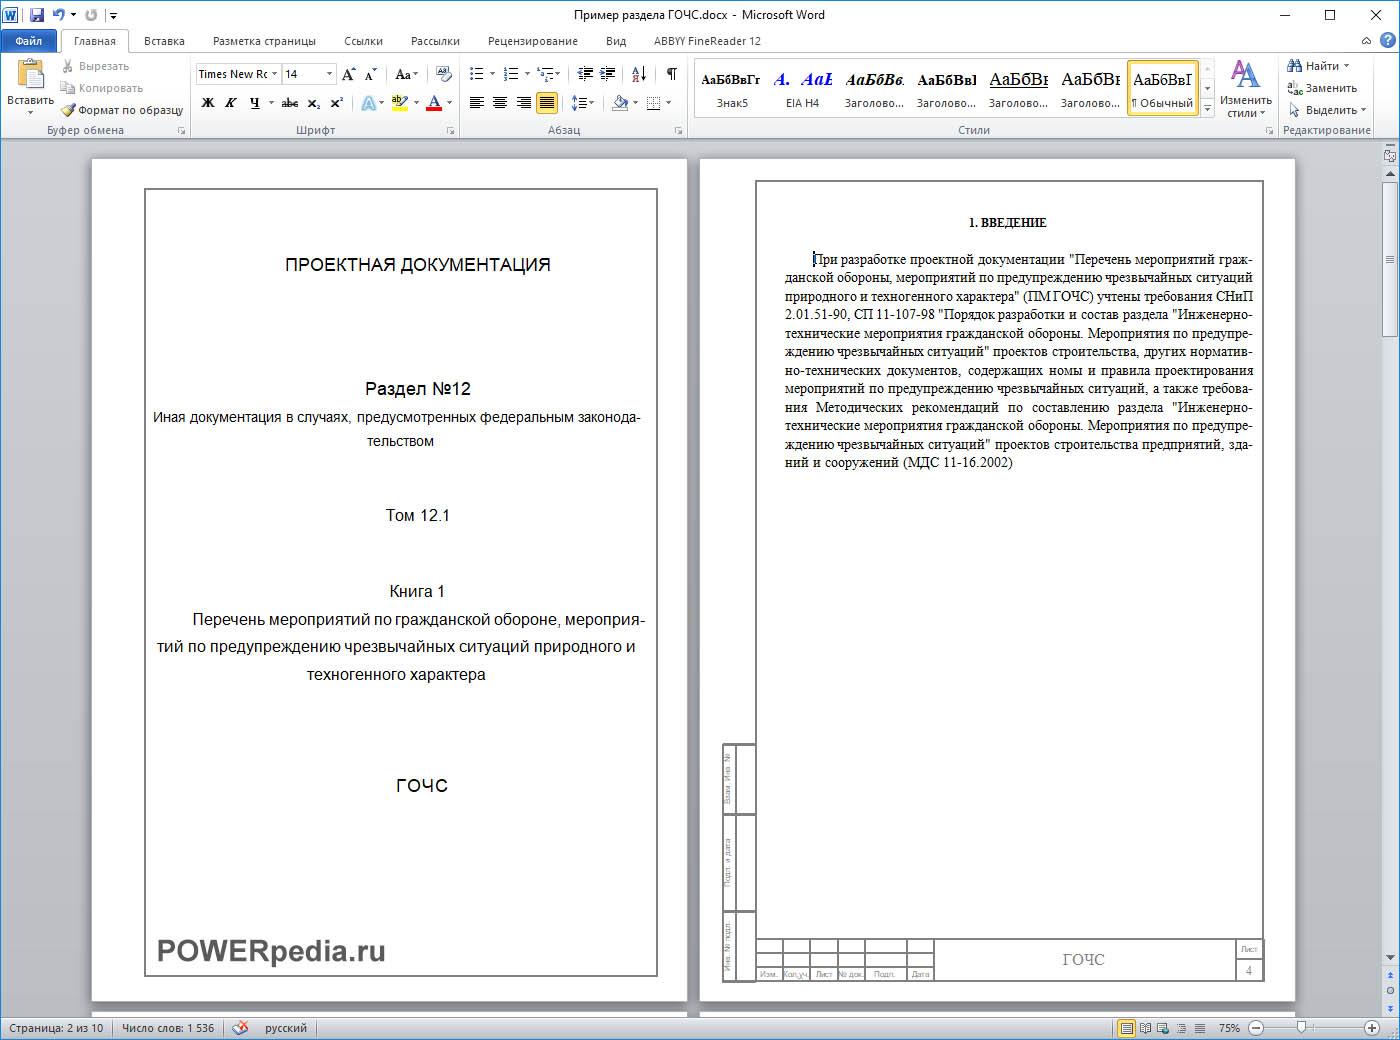 Пример раздела ГОЧС в формате MS Word.